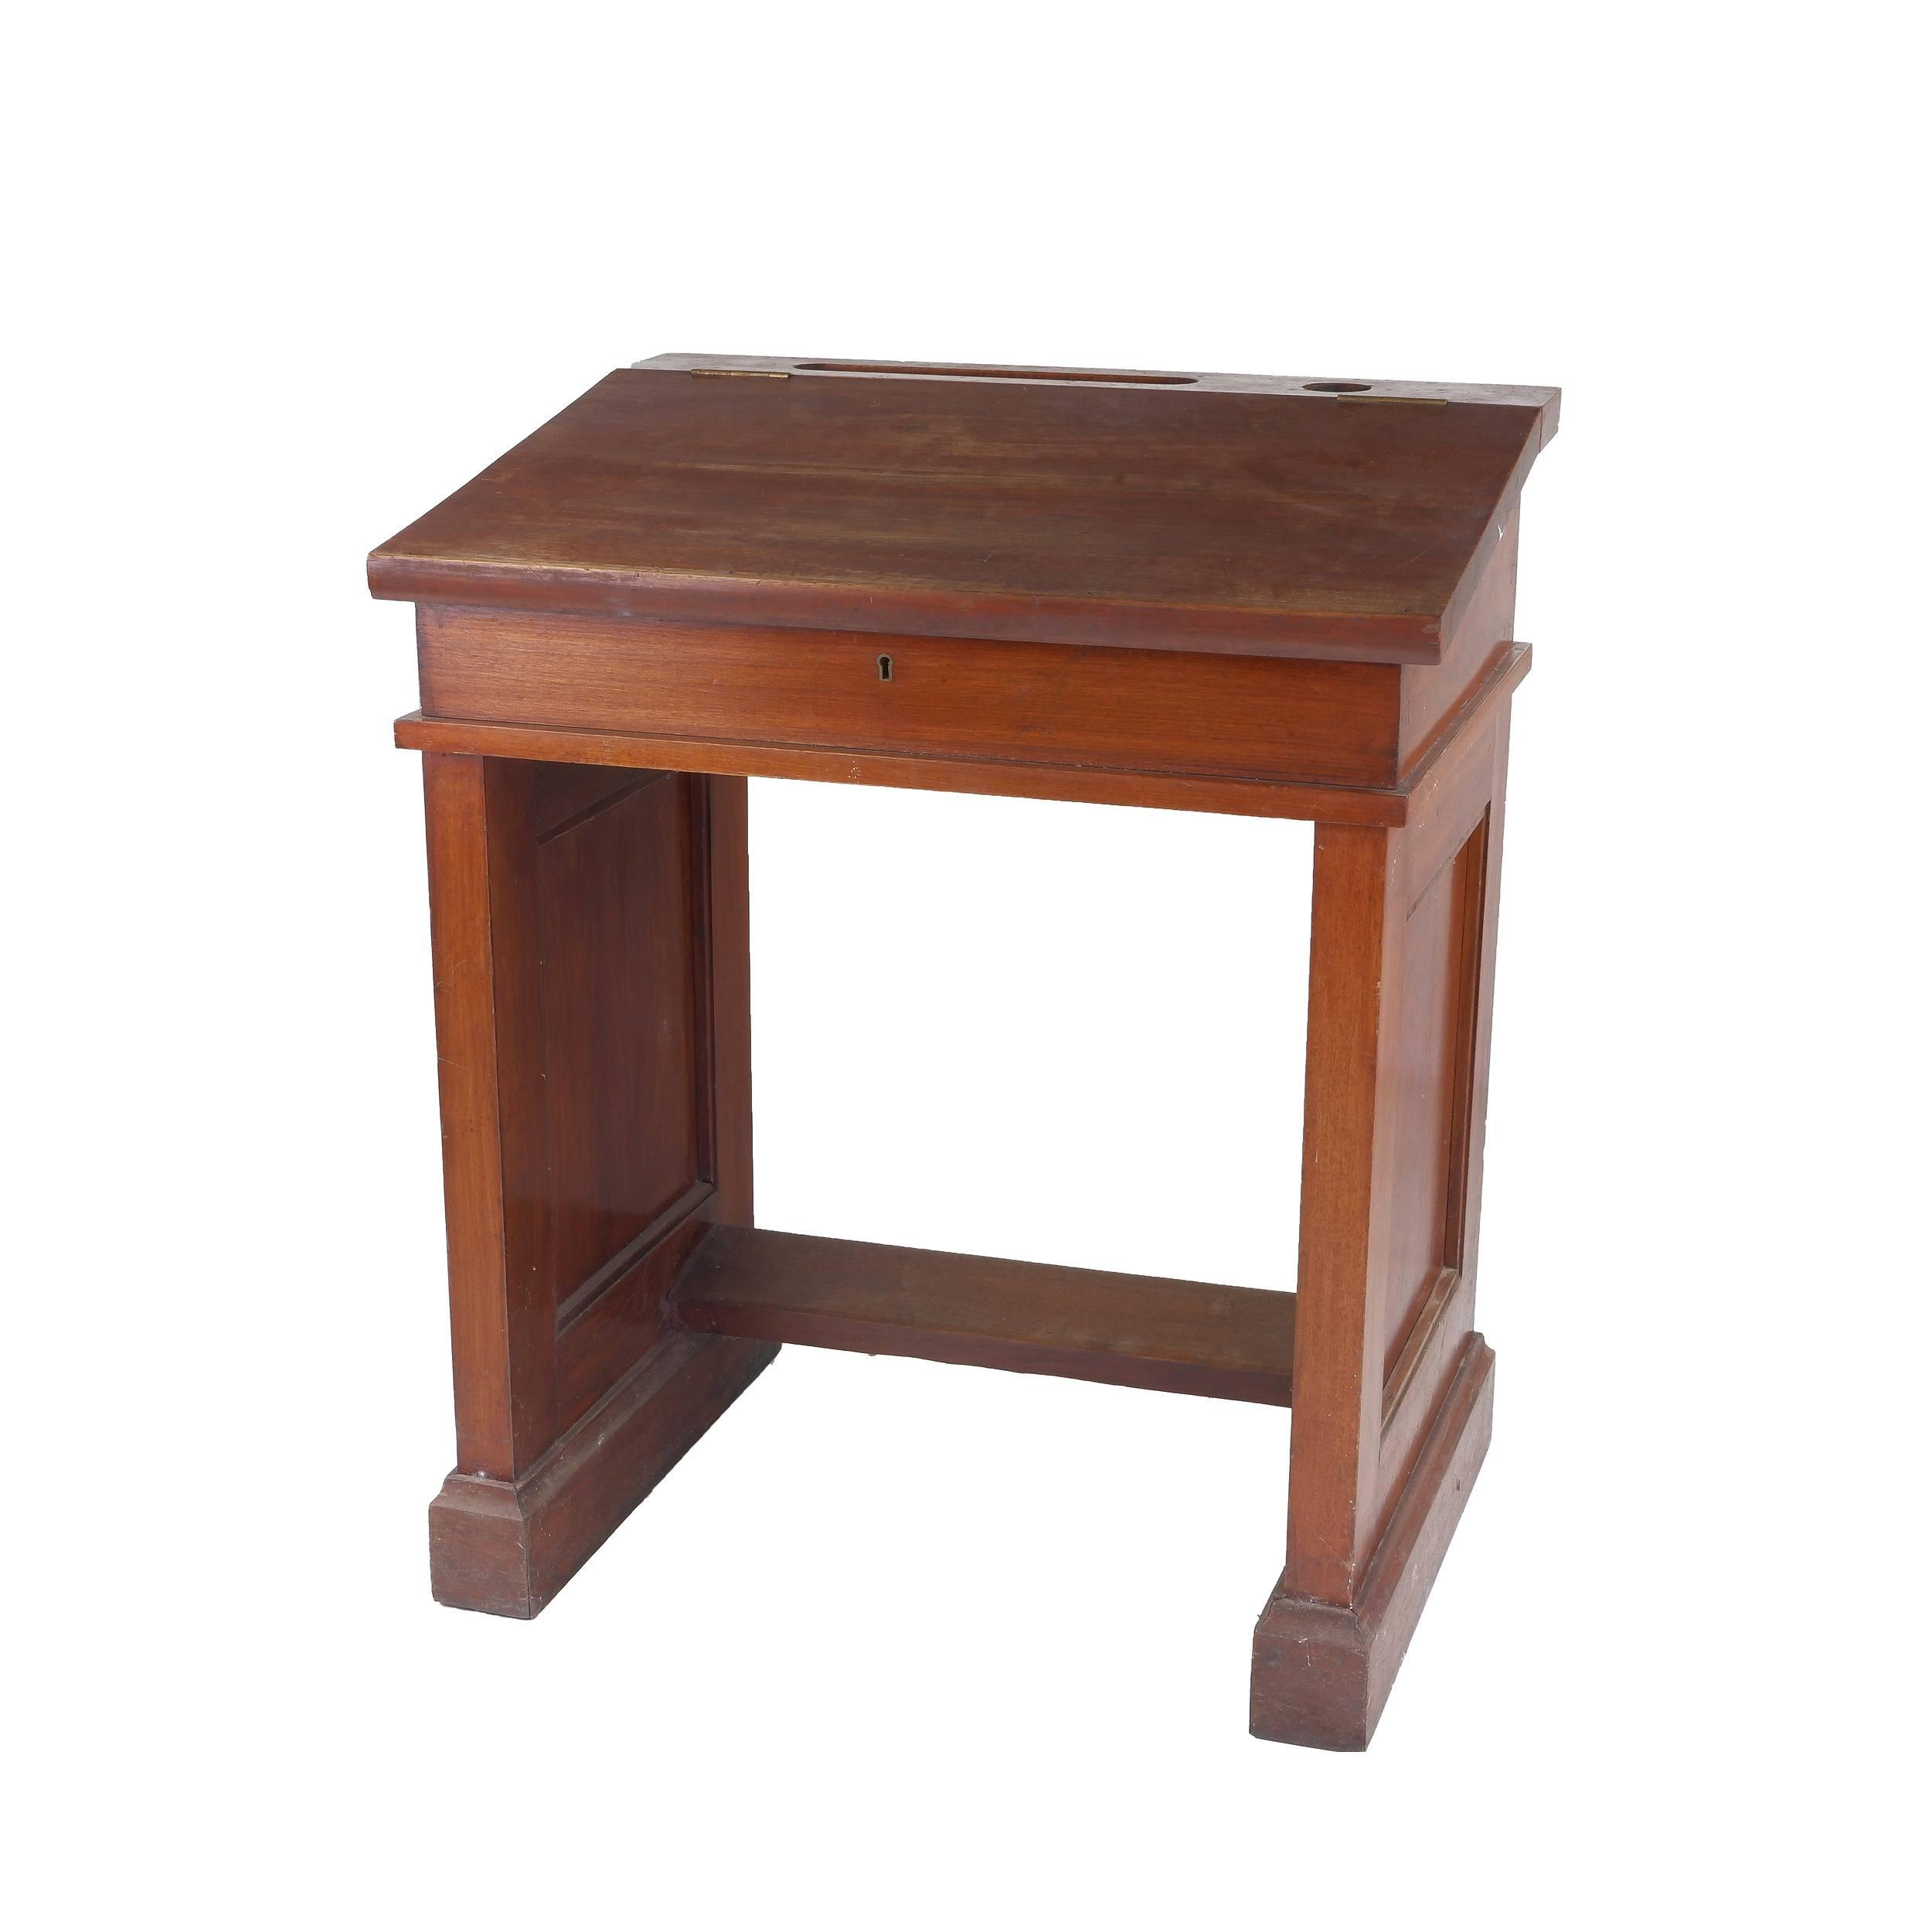 'Good Solid Tasmanian Blackwood School or Clerks Desk Circa 1920s'